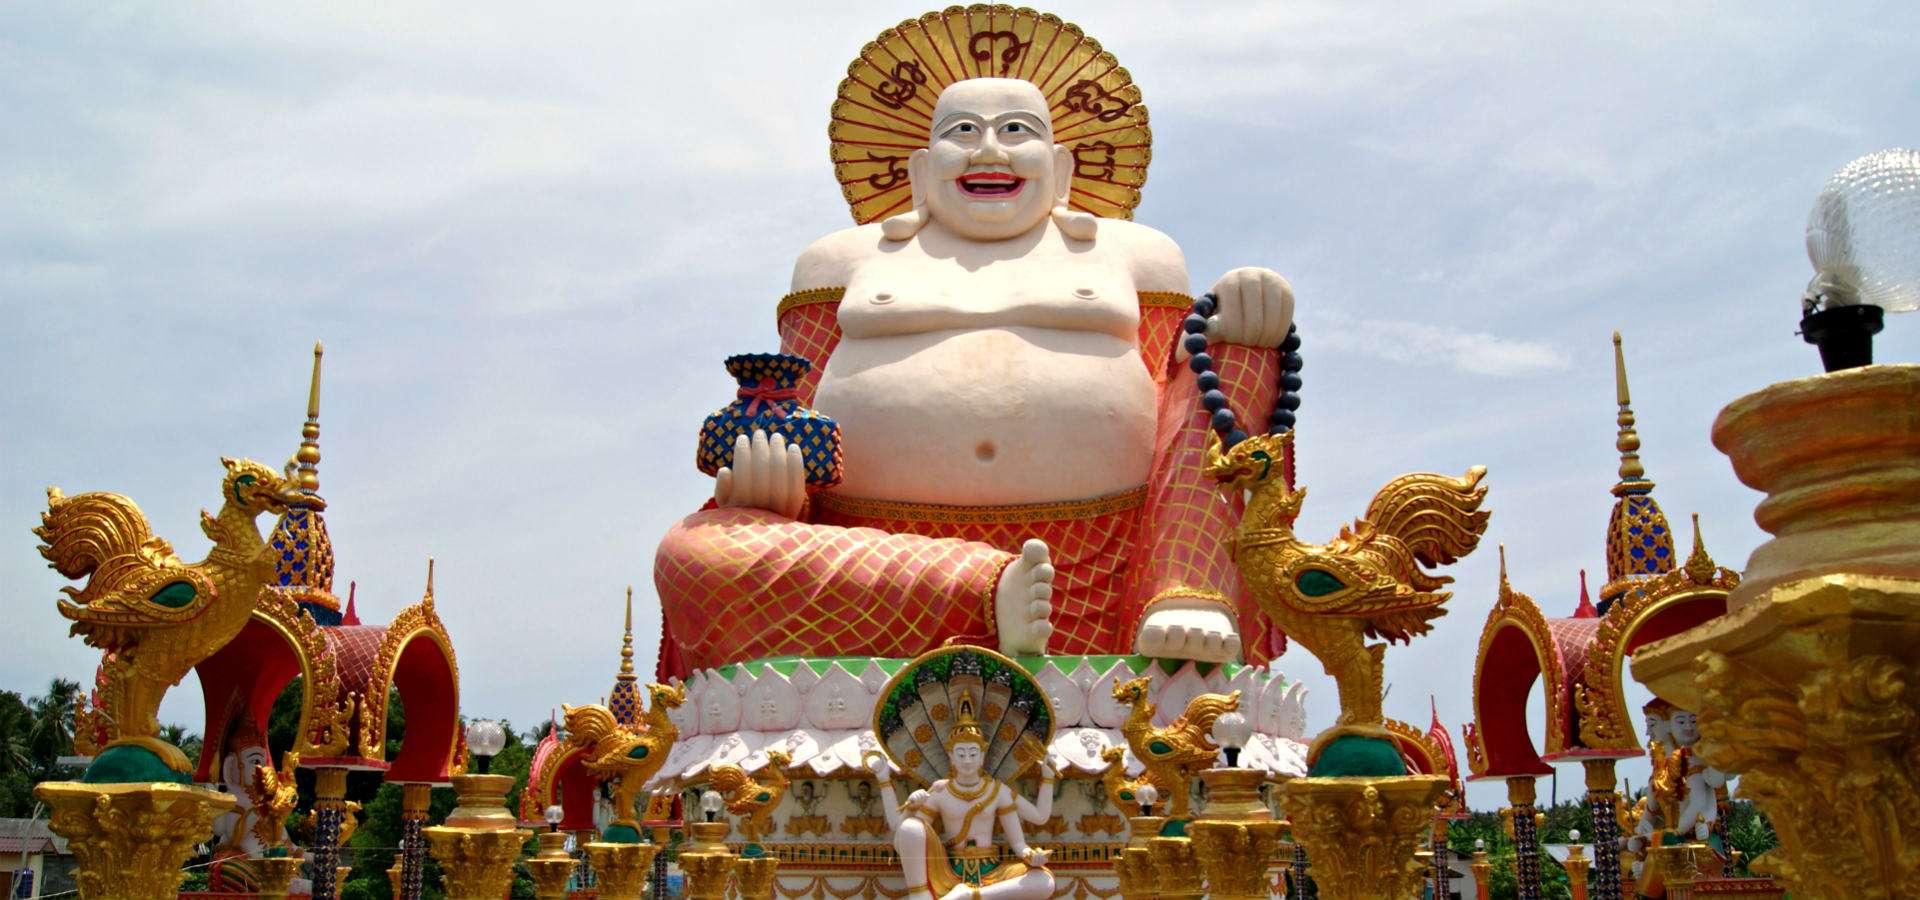 Wat Plai Laem Tempel, grote dikke lachende Boeddha op Koh Samui in Thailand